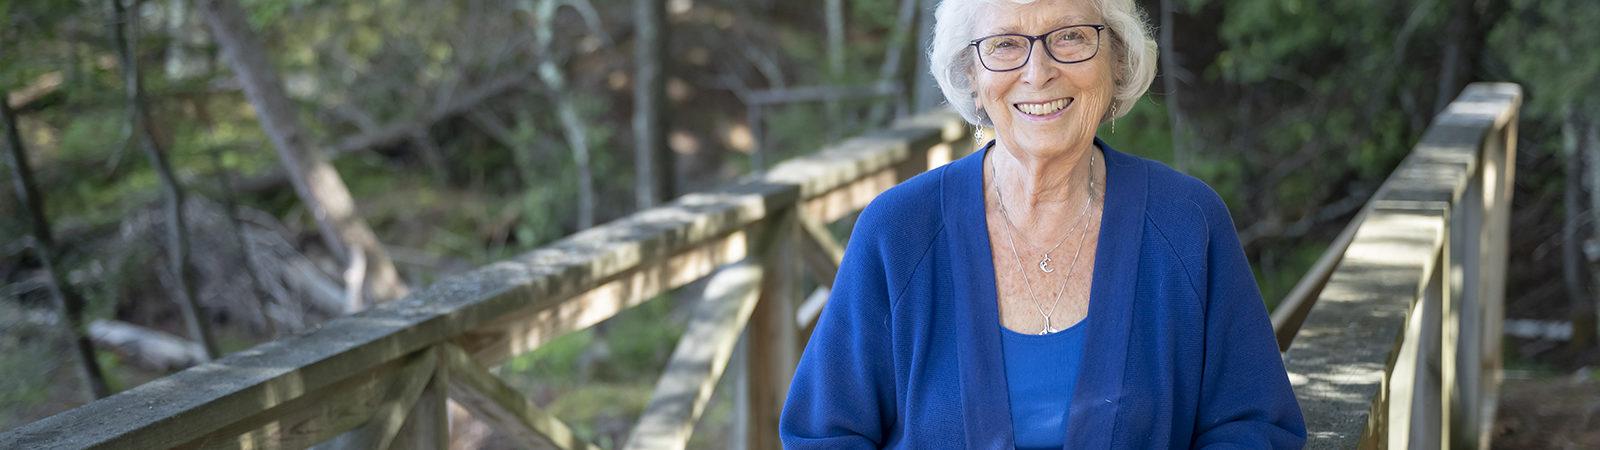 Carolyn Sneed standing on a bridge